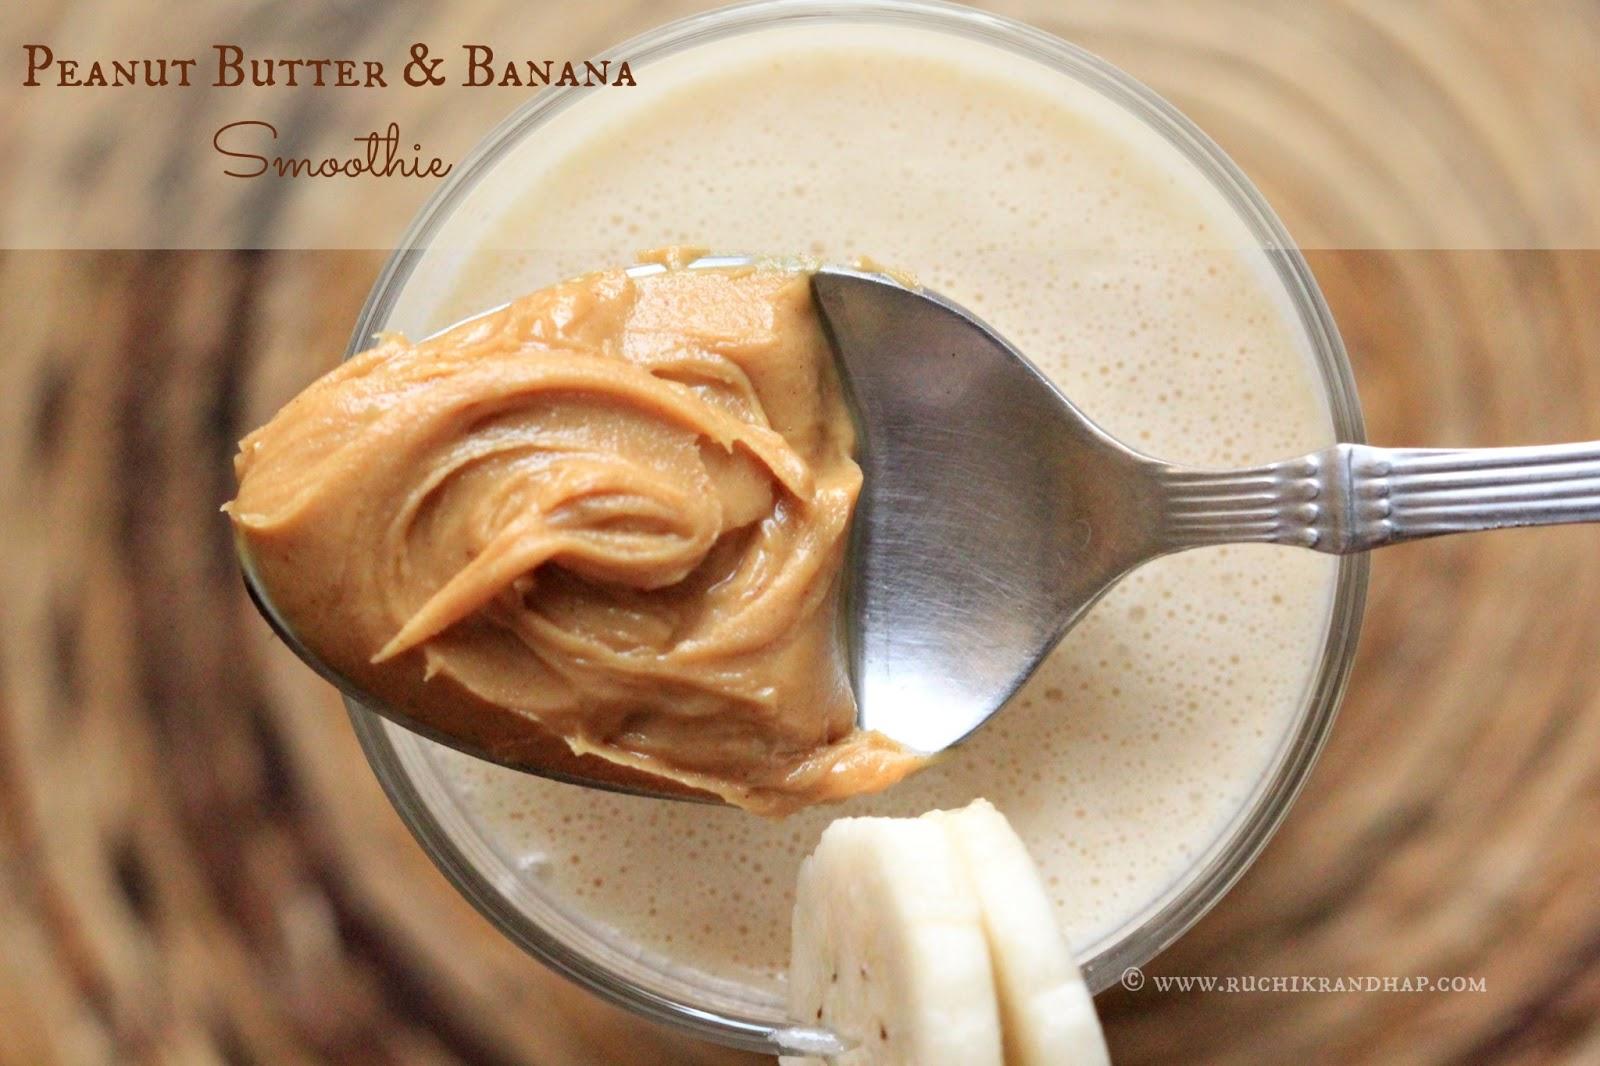 Ruchik Randhap (Delicious Cooking): Peanut Butter & Banana Smoothie